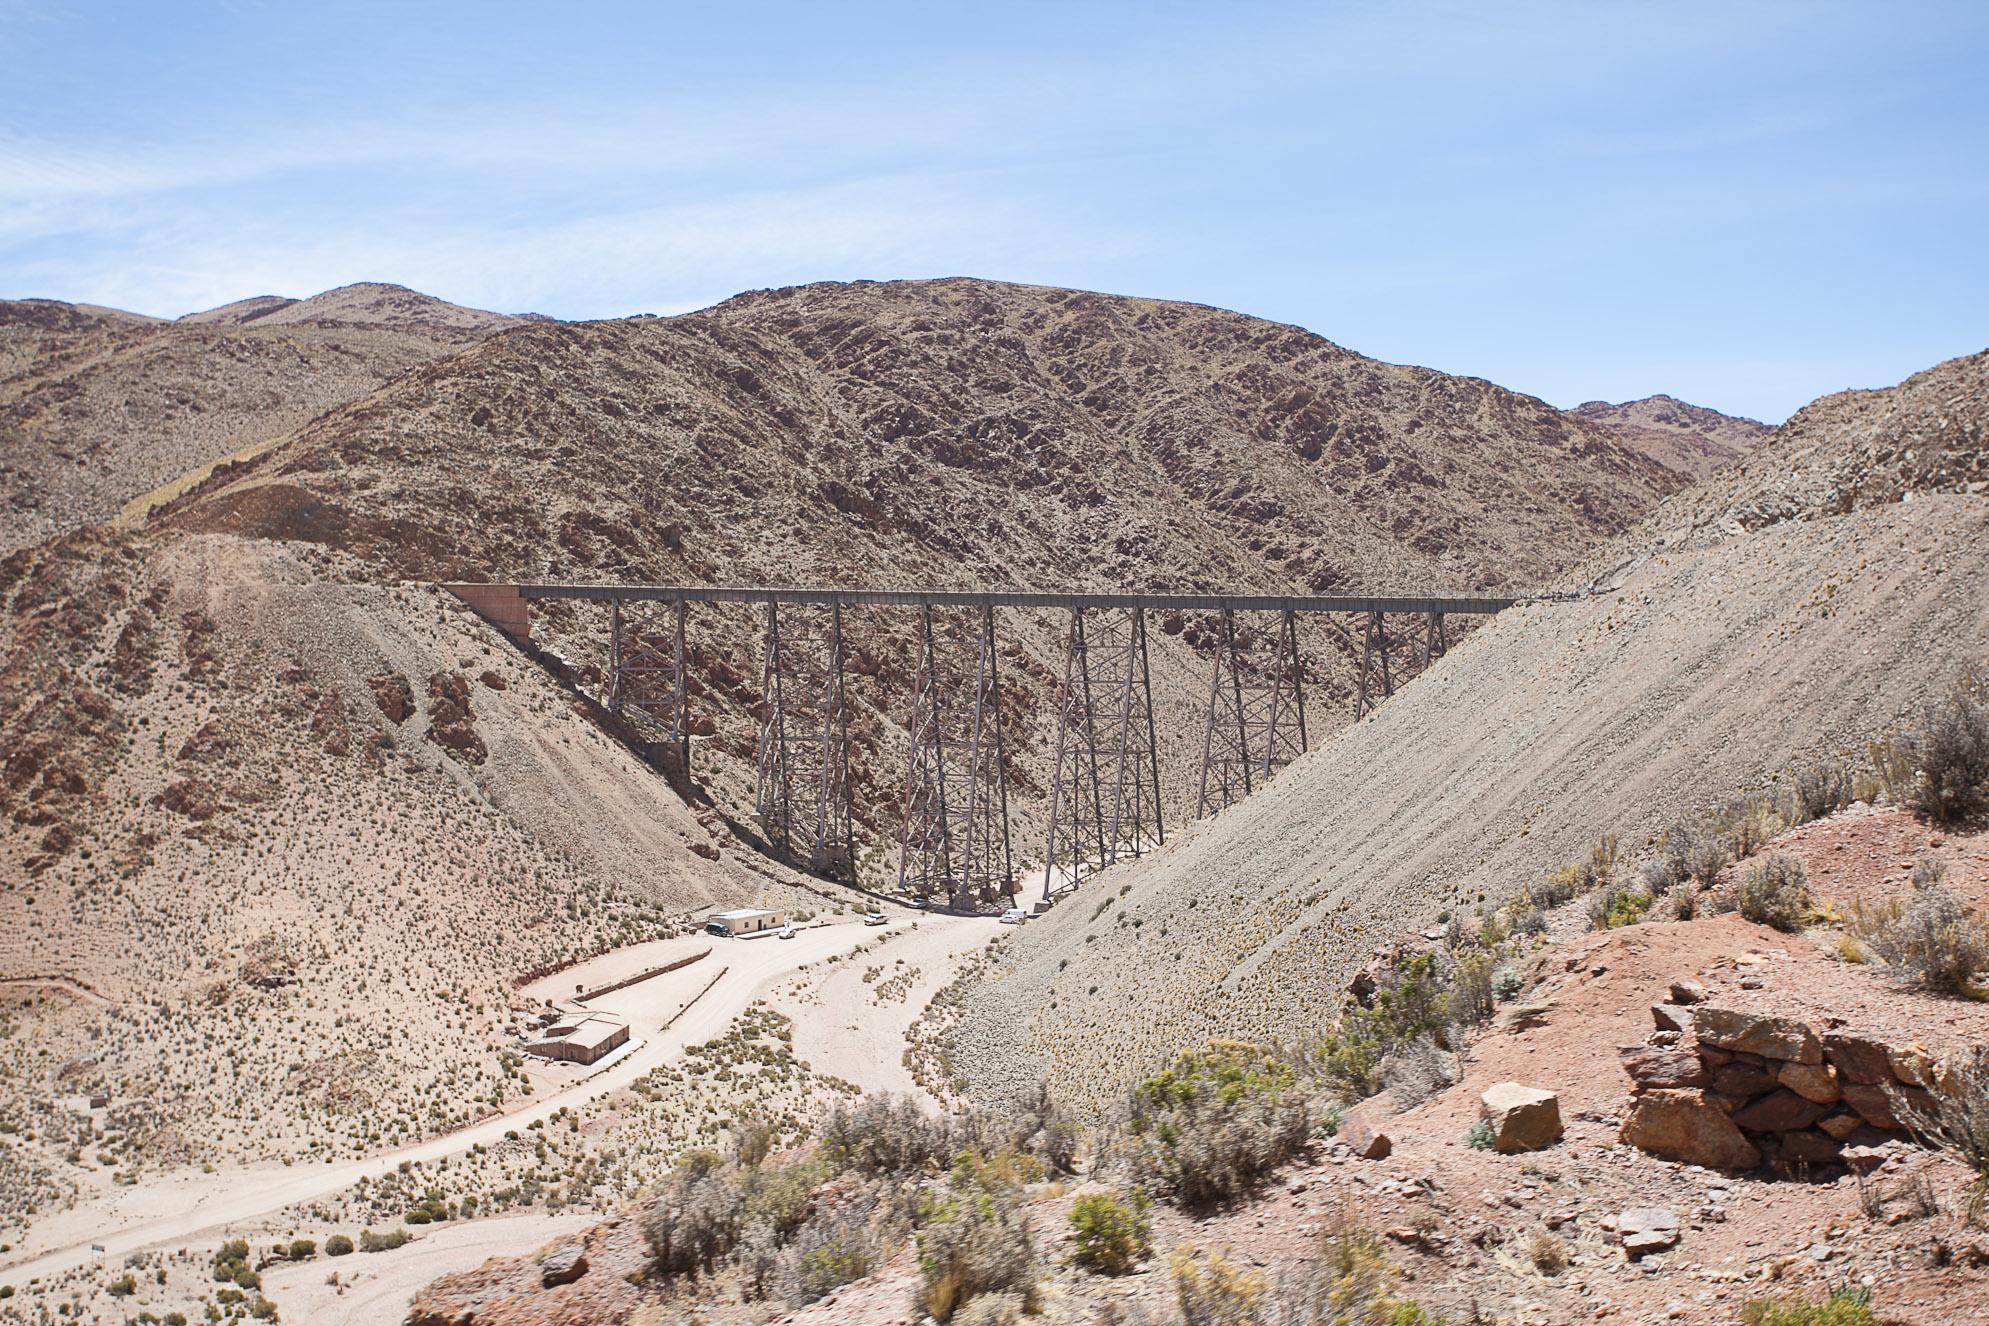 Viaducto La Polvorilla